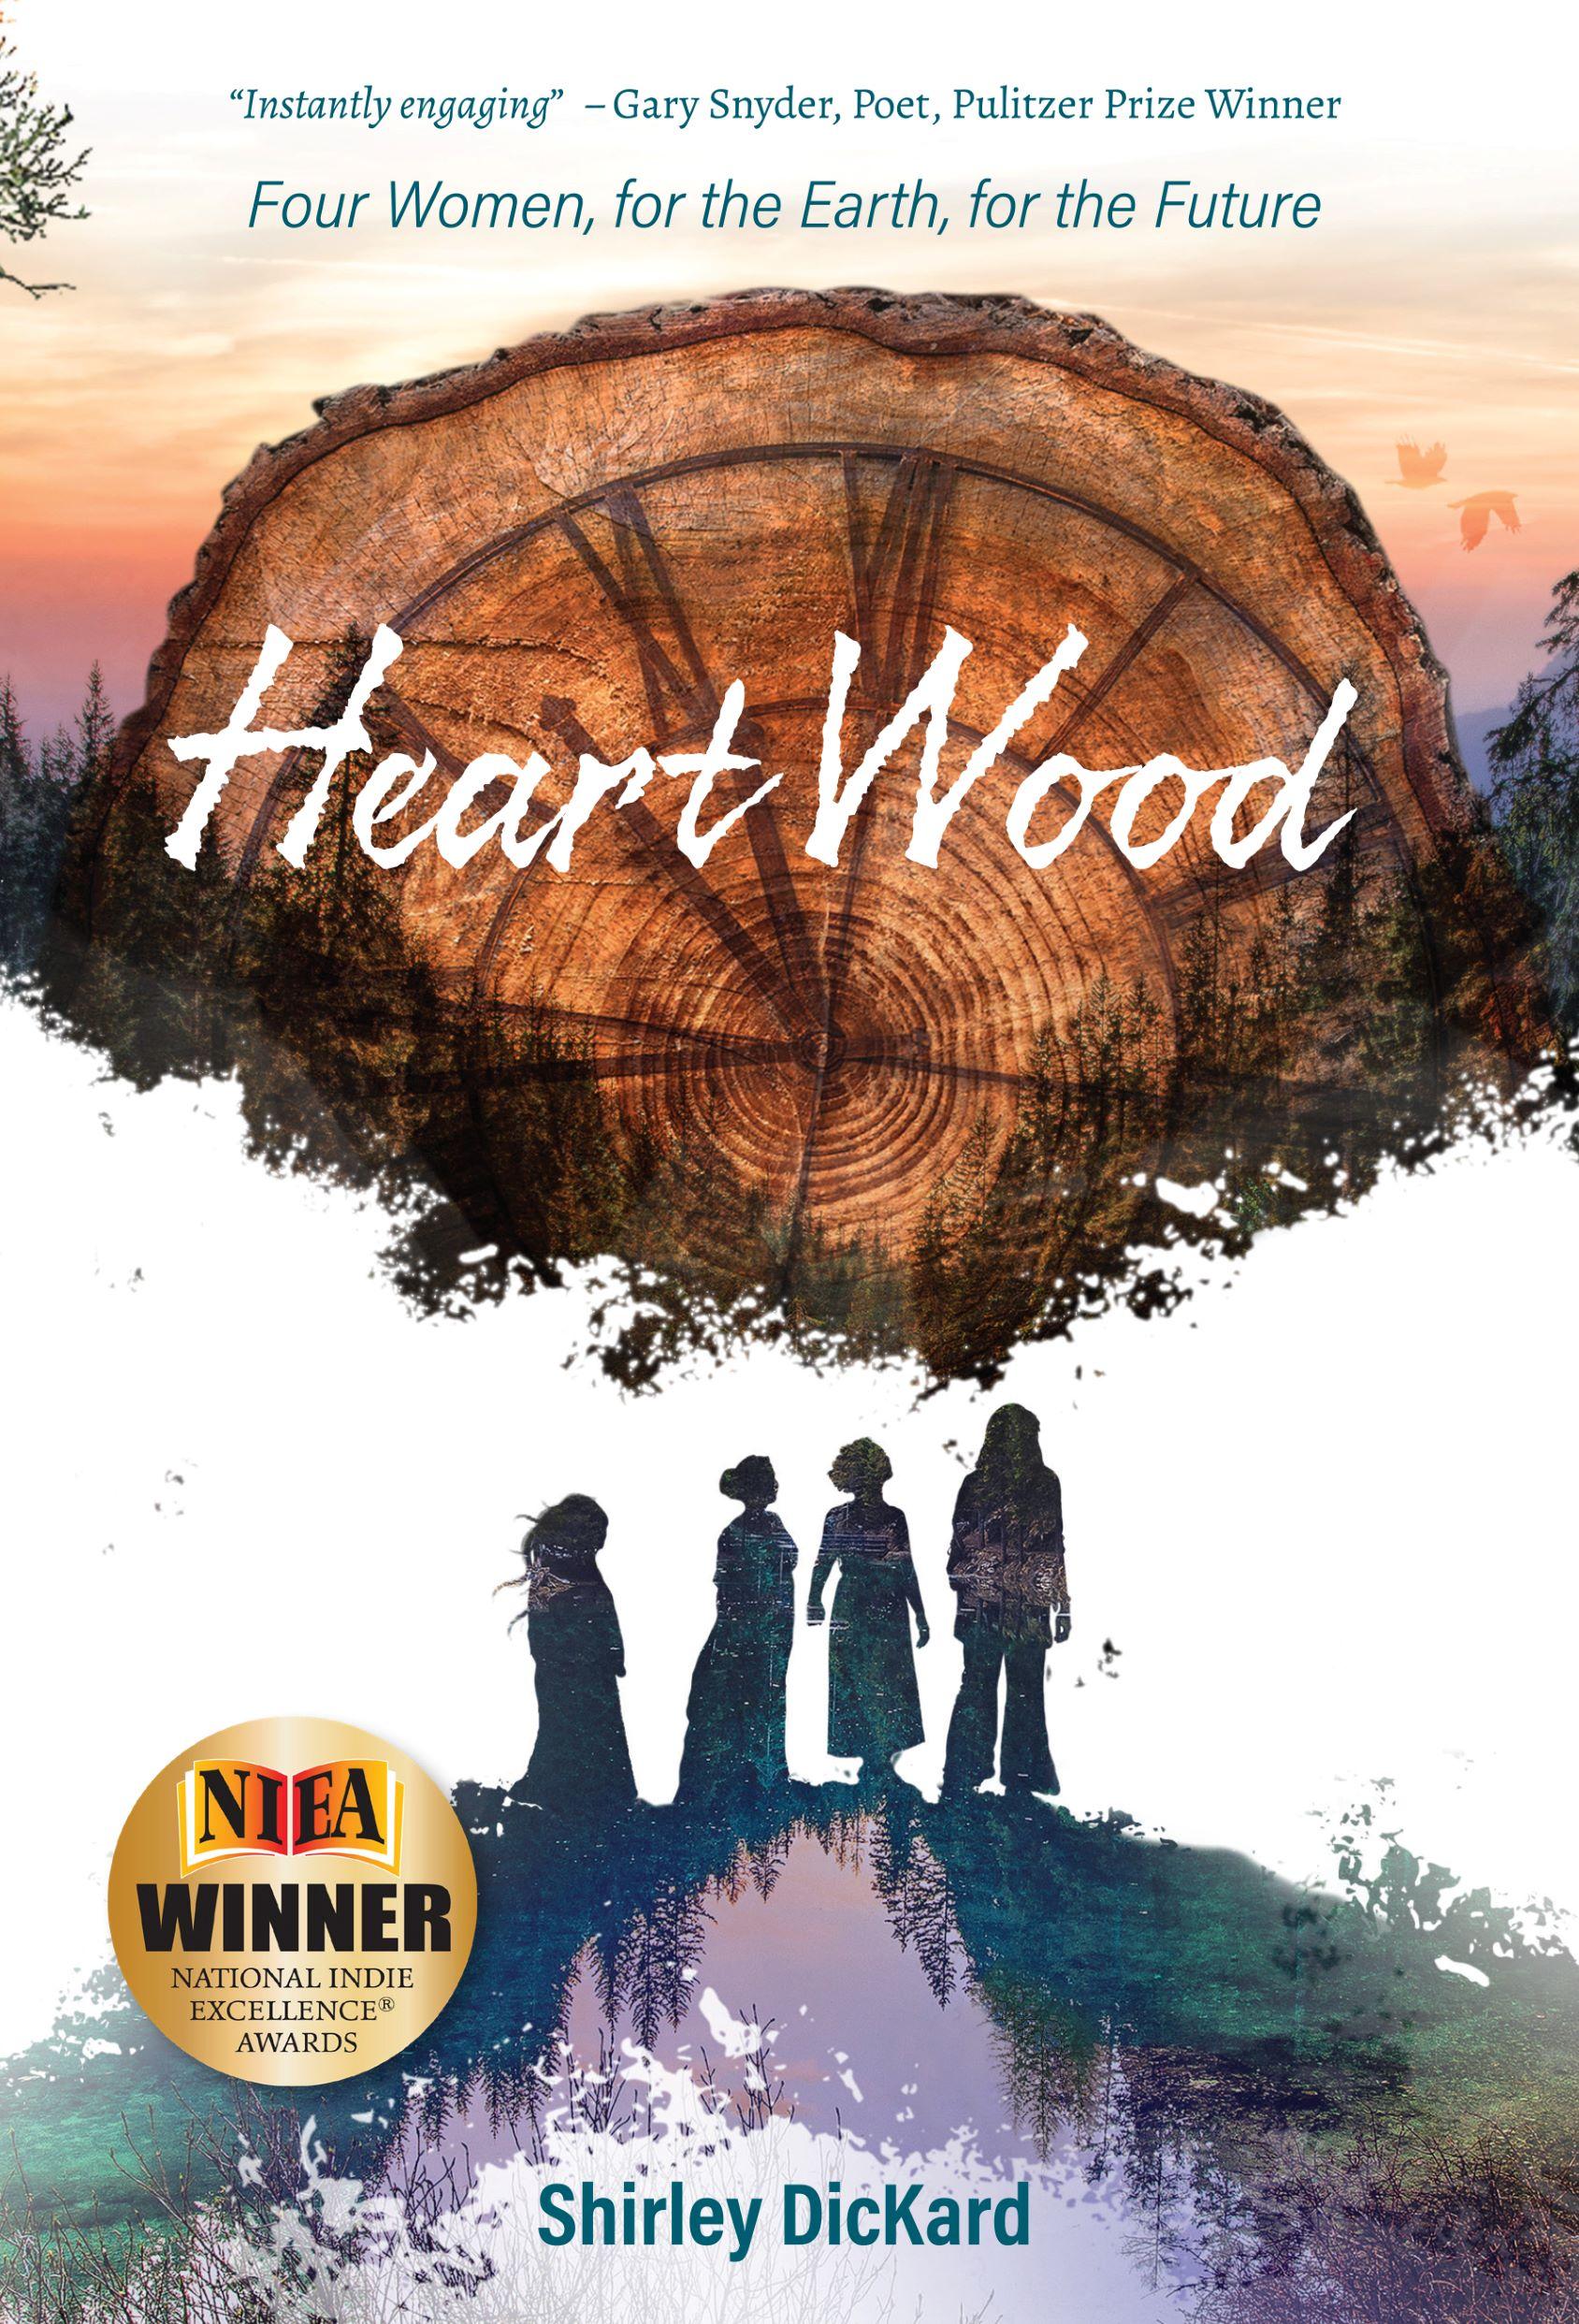 Heart Wood_cover_NIEA 072021.lg[98]